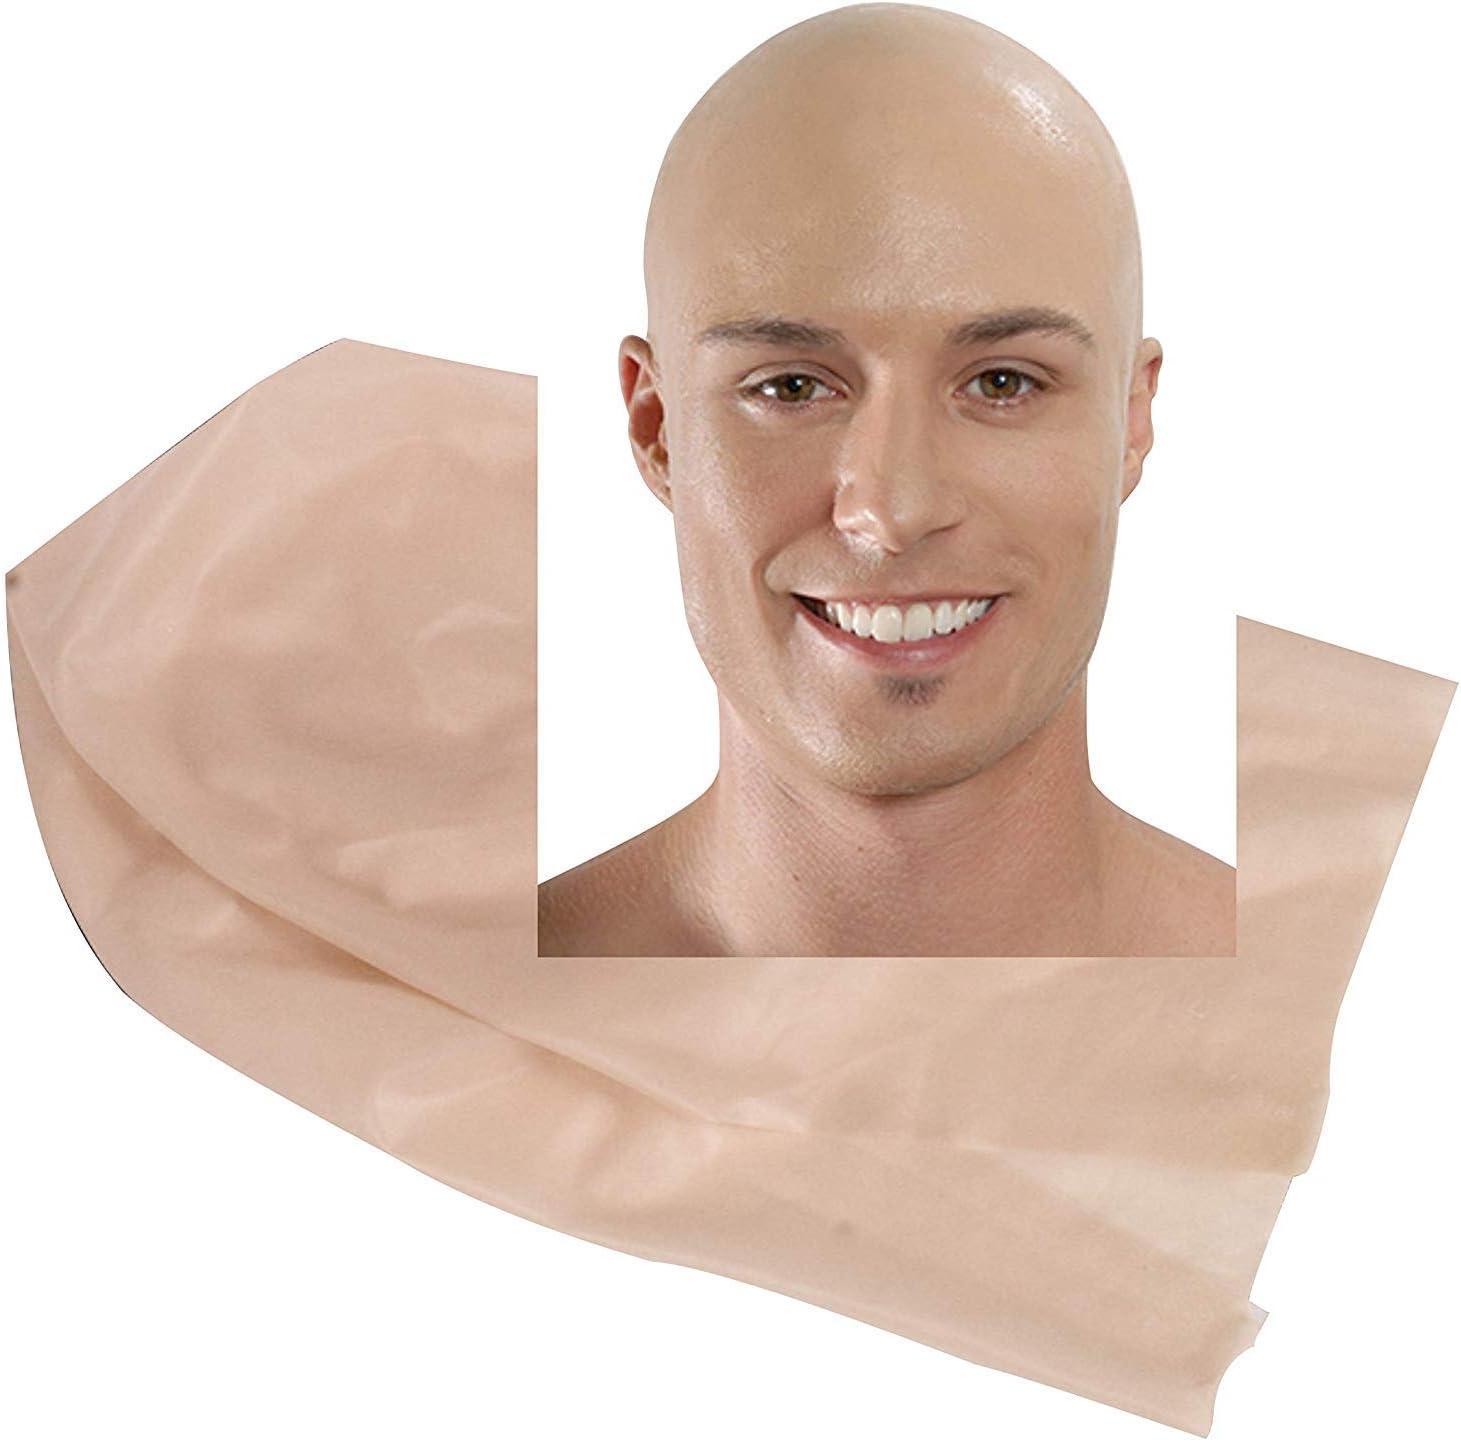 Latex Bald Cap